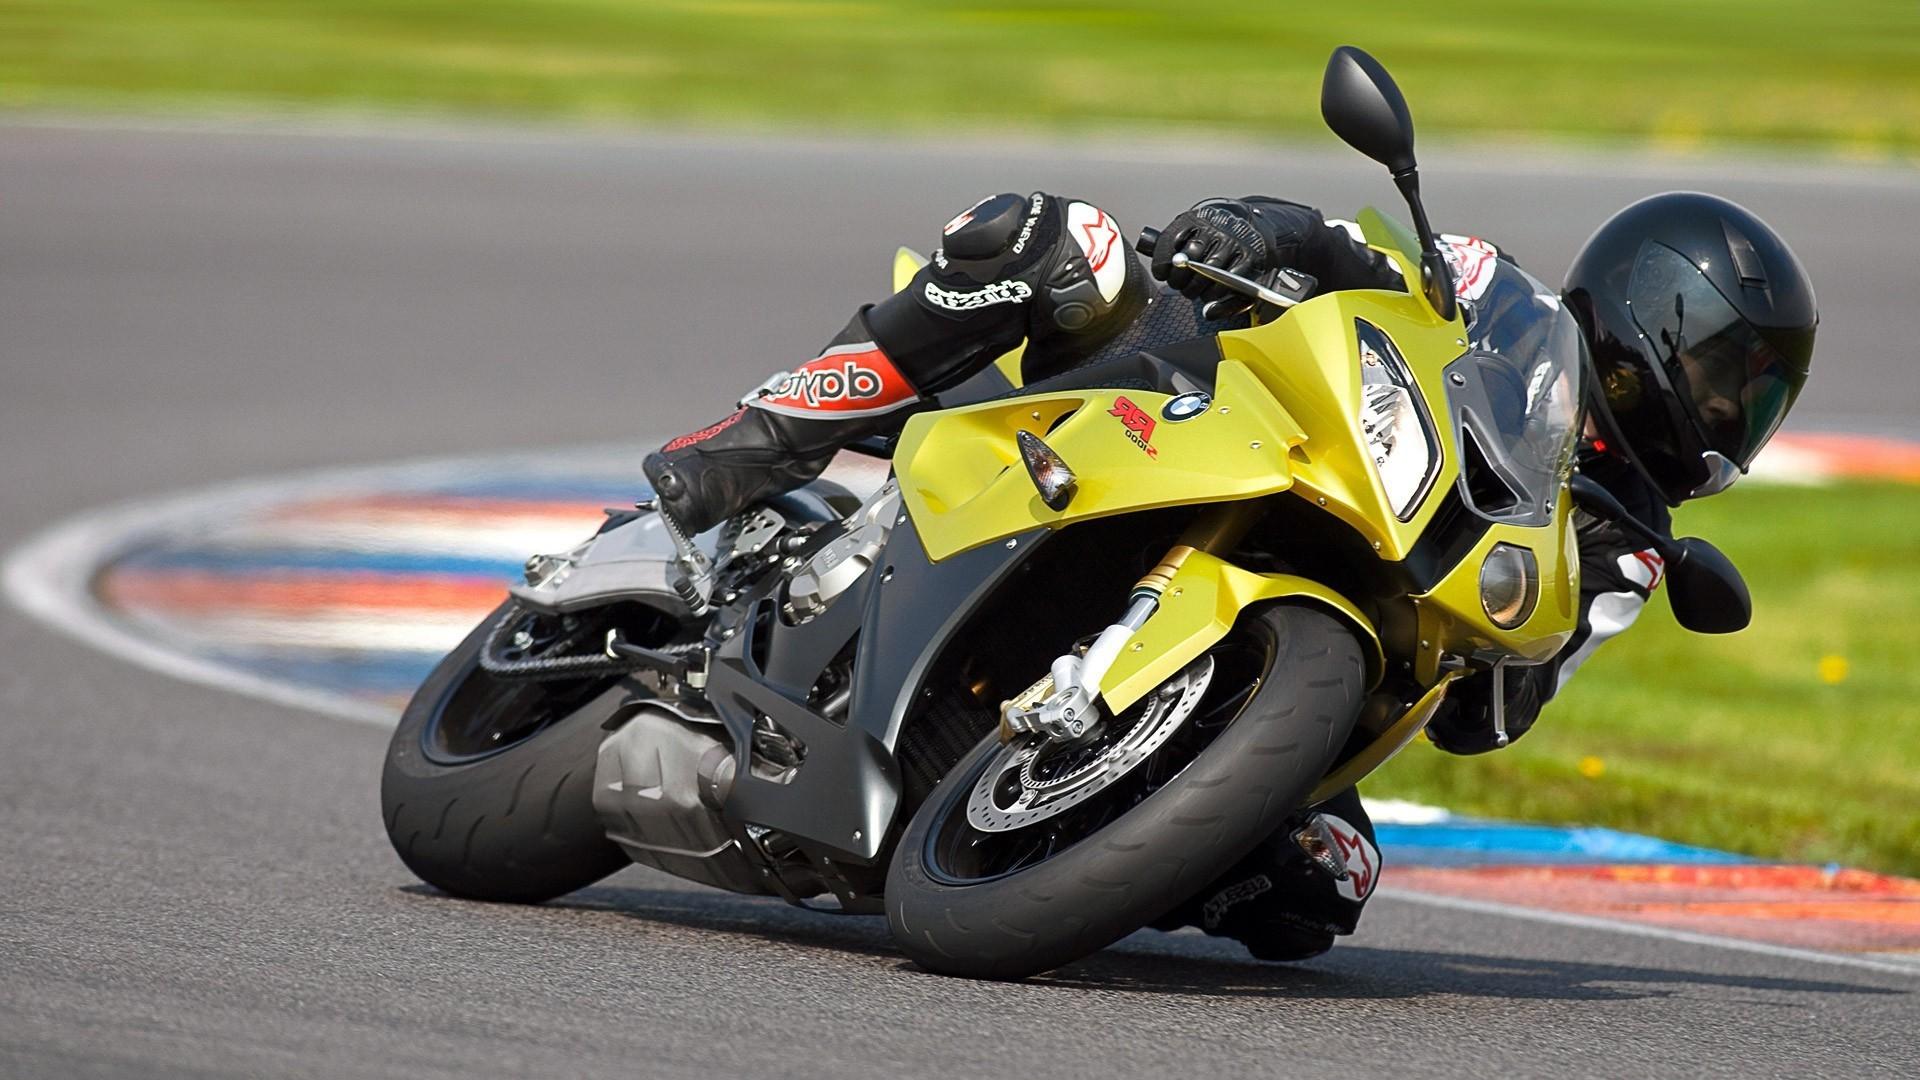 мотоциклы спорт гонка bmw s1000rr анонимно